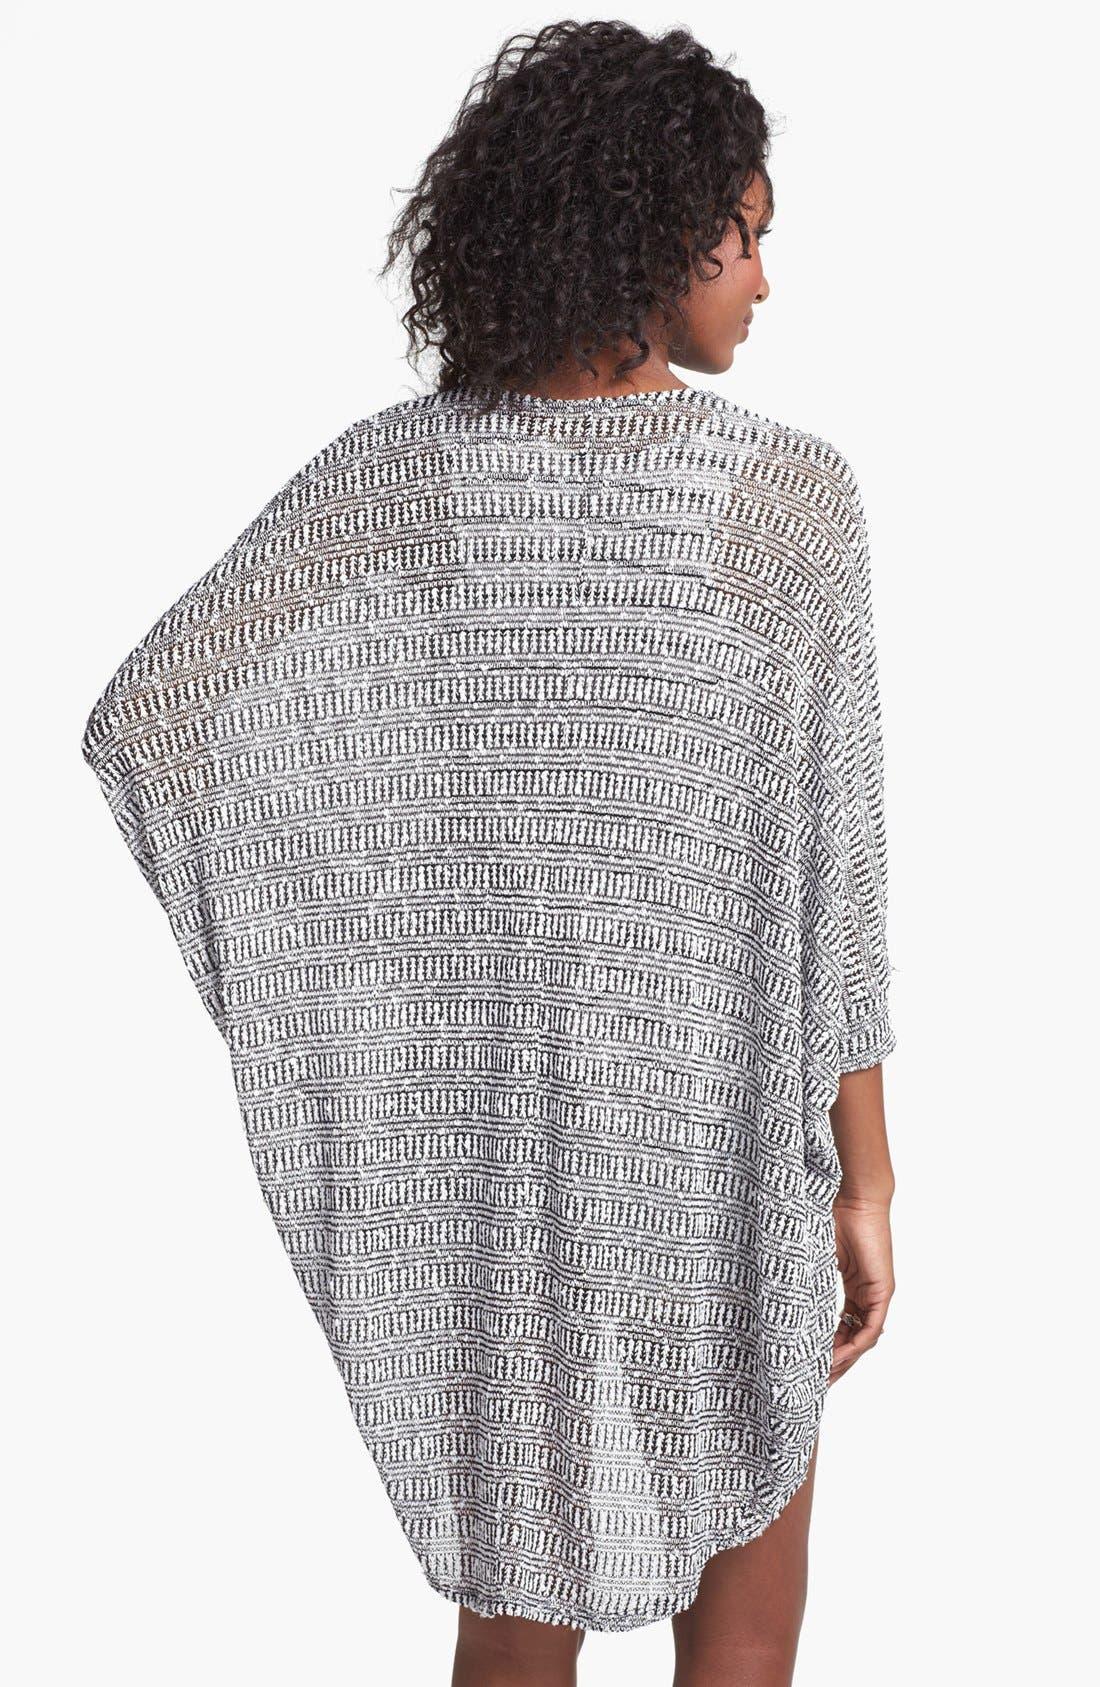 Alternate Image 2  - Painted Threads Oversized Sheer Knit Cardigan (Juniors)